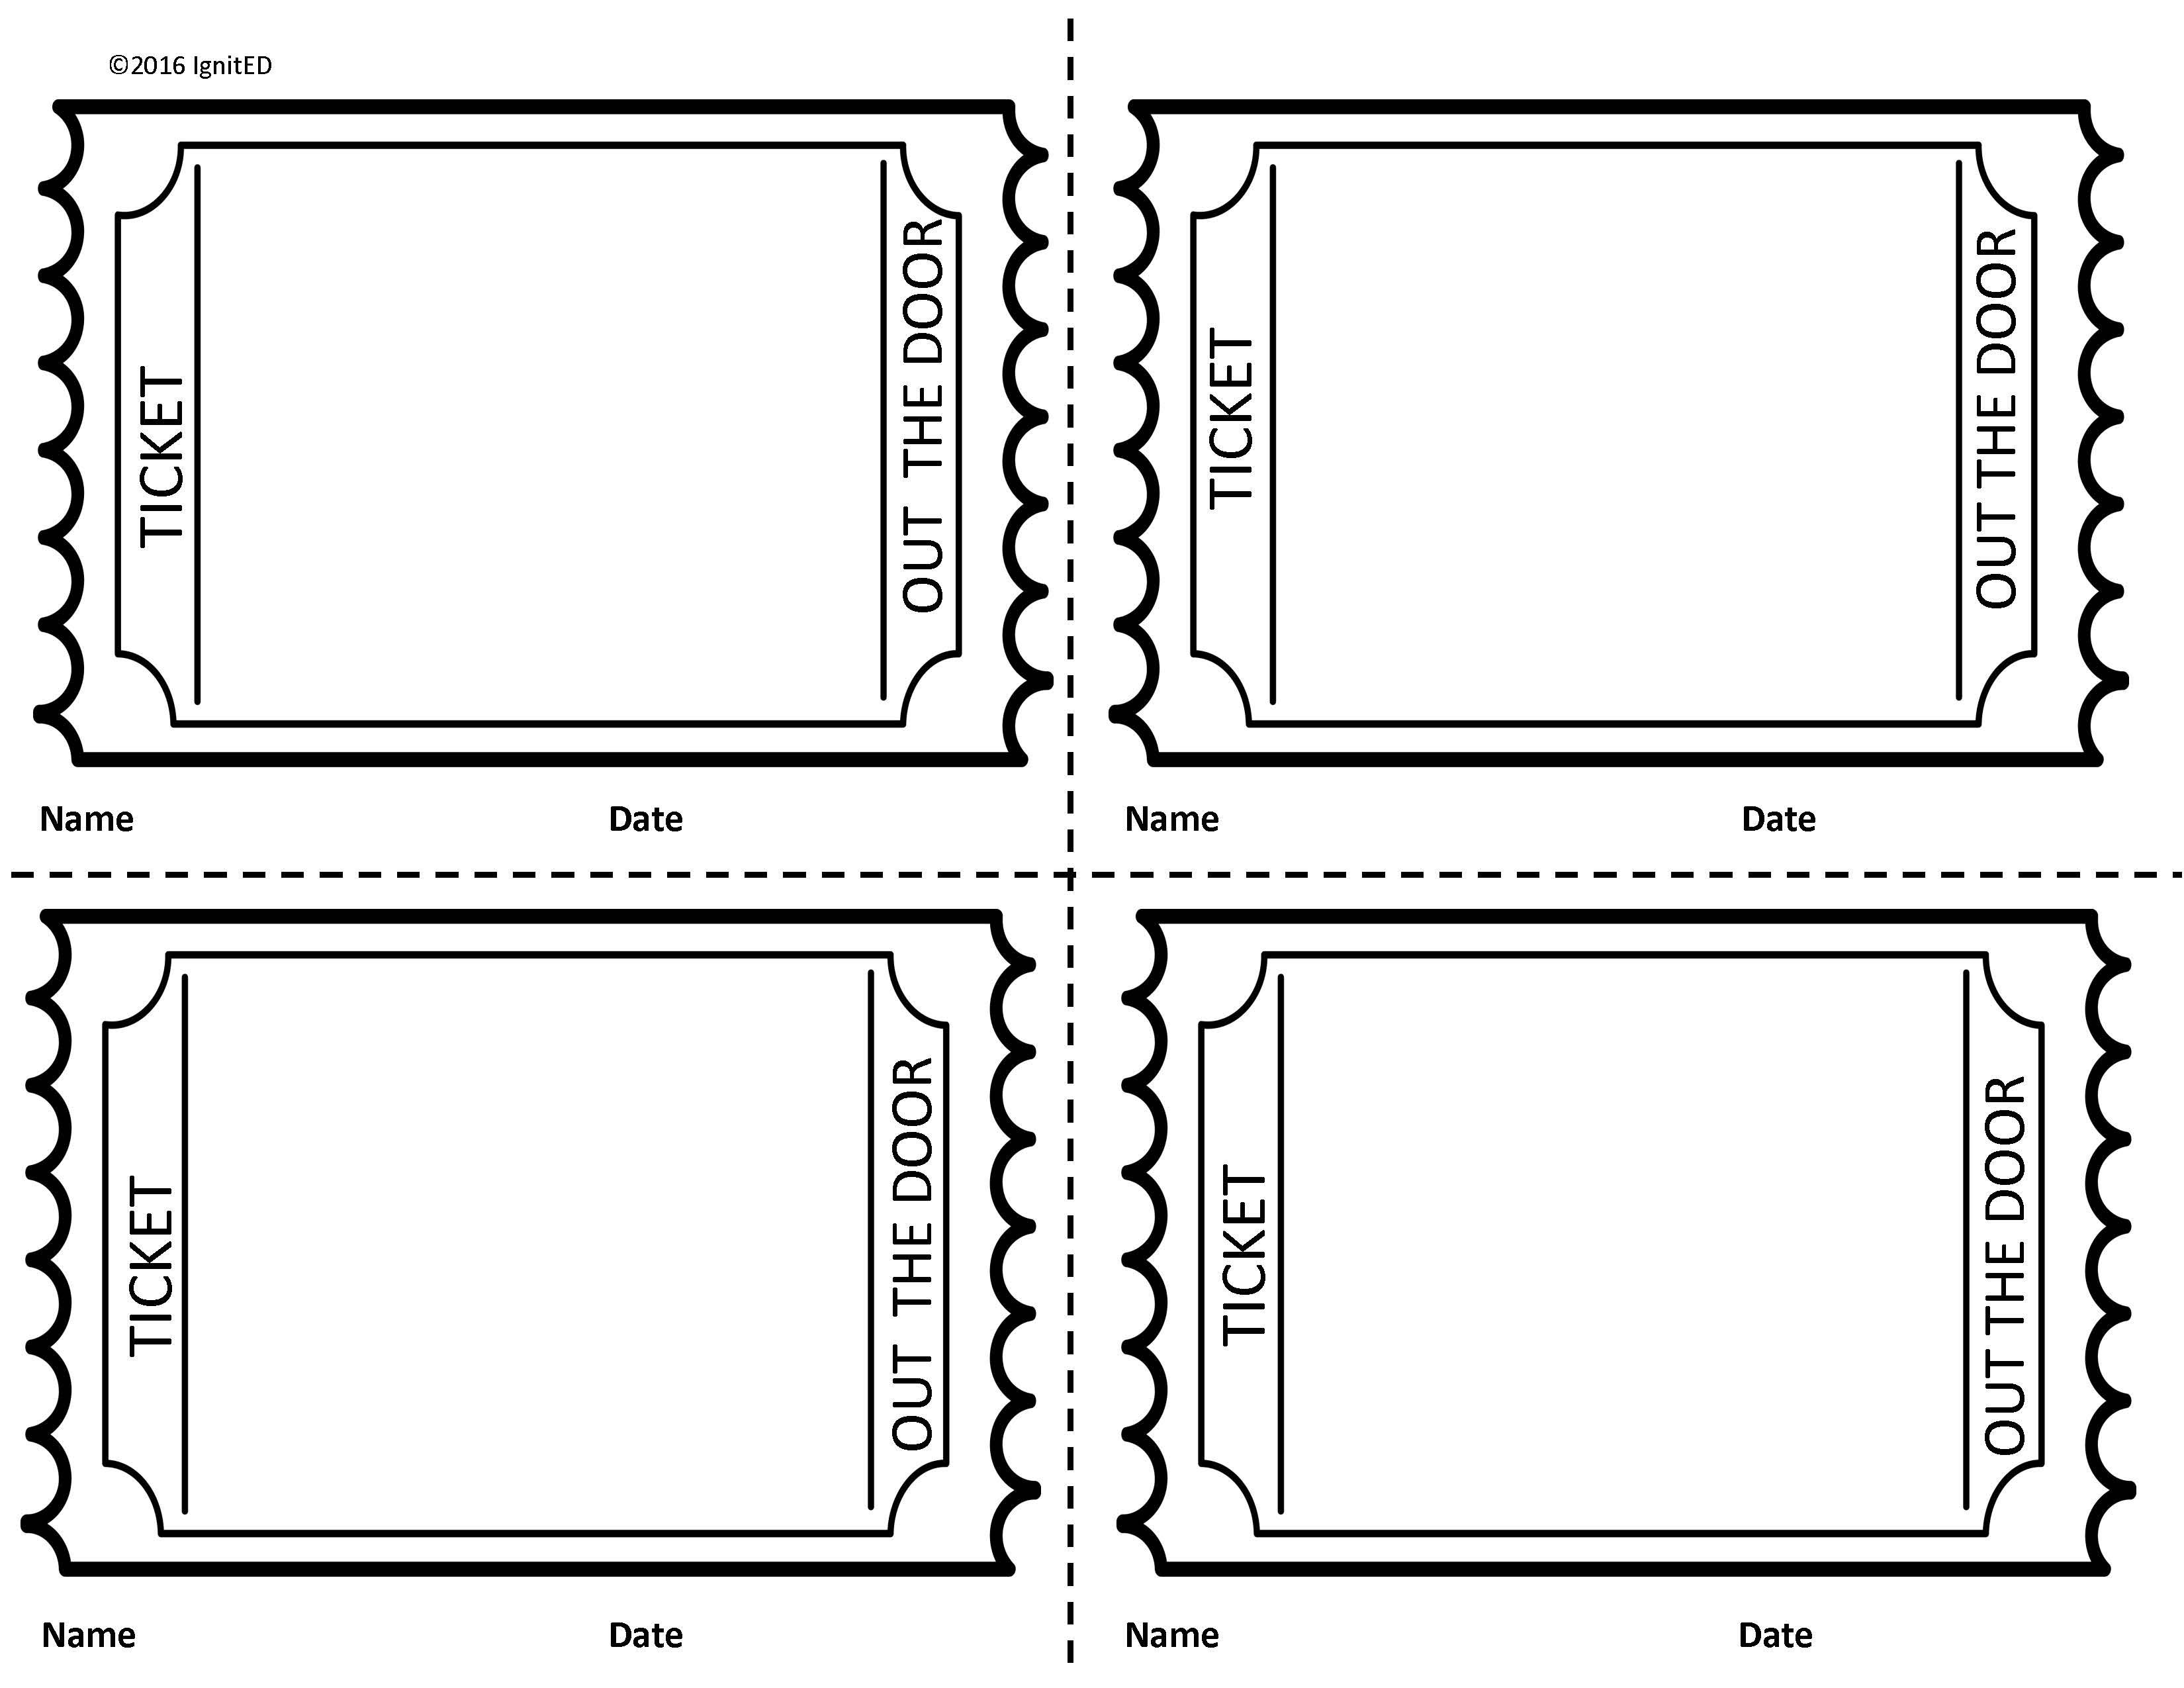 plickers exit ticket ignited. Black Bedroom Furniture Sets. Home Design Ideas